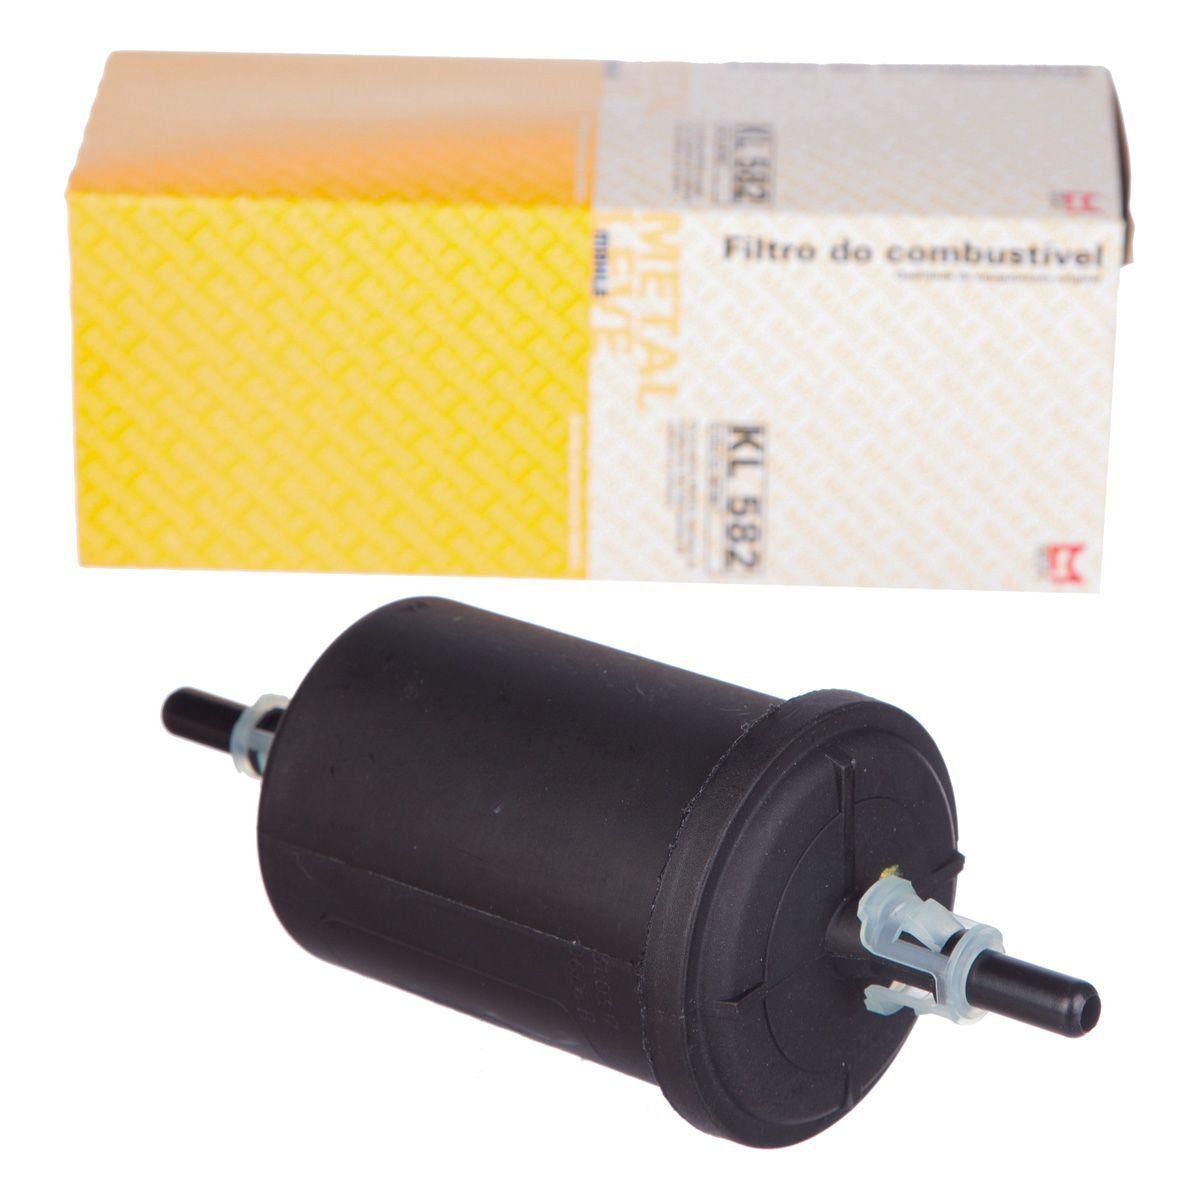 Filtro combustivel flex - Prisma de 2007 a 2020